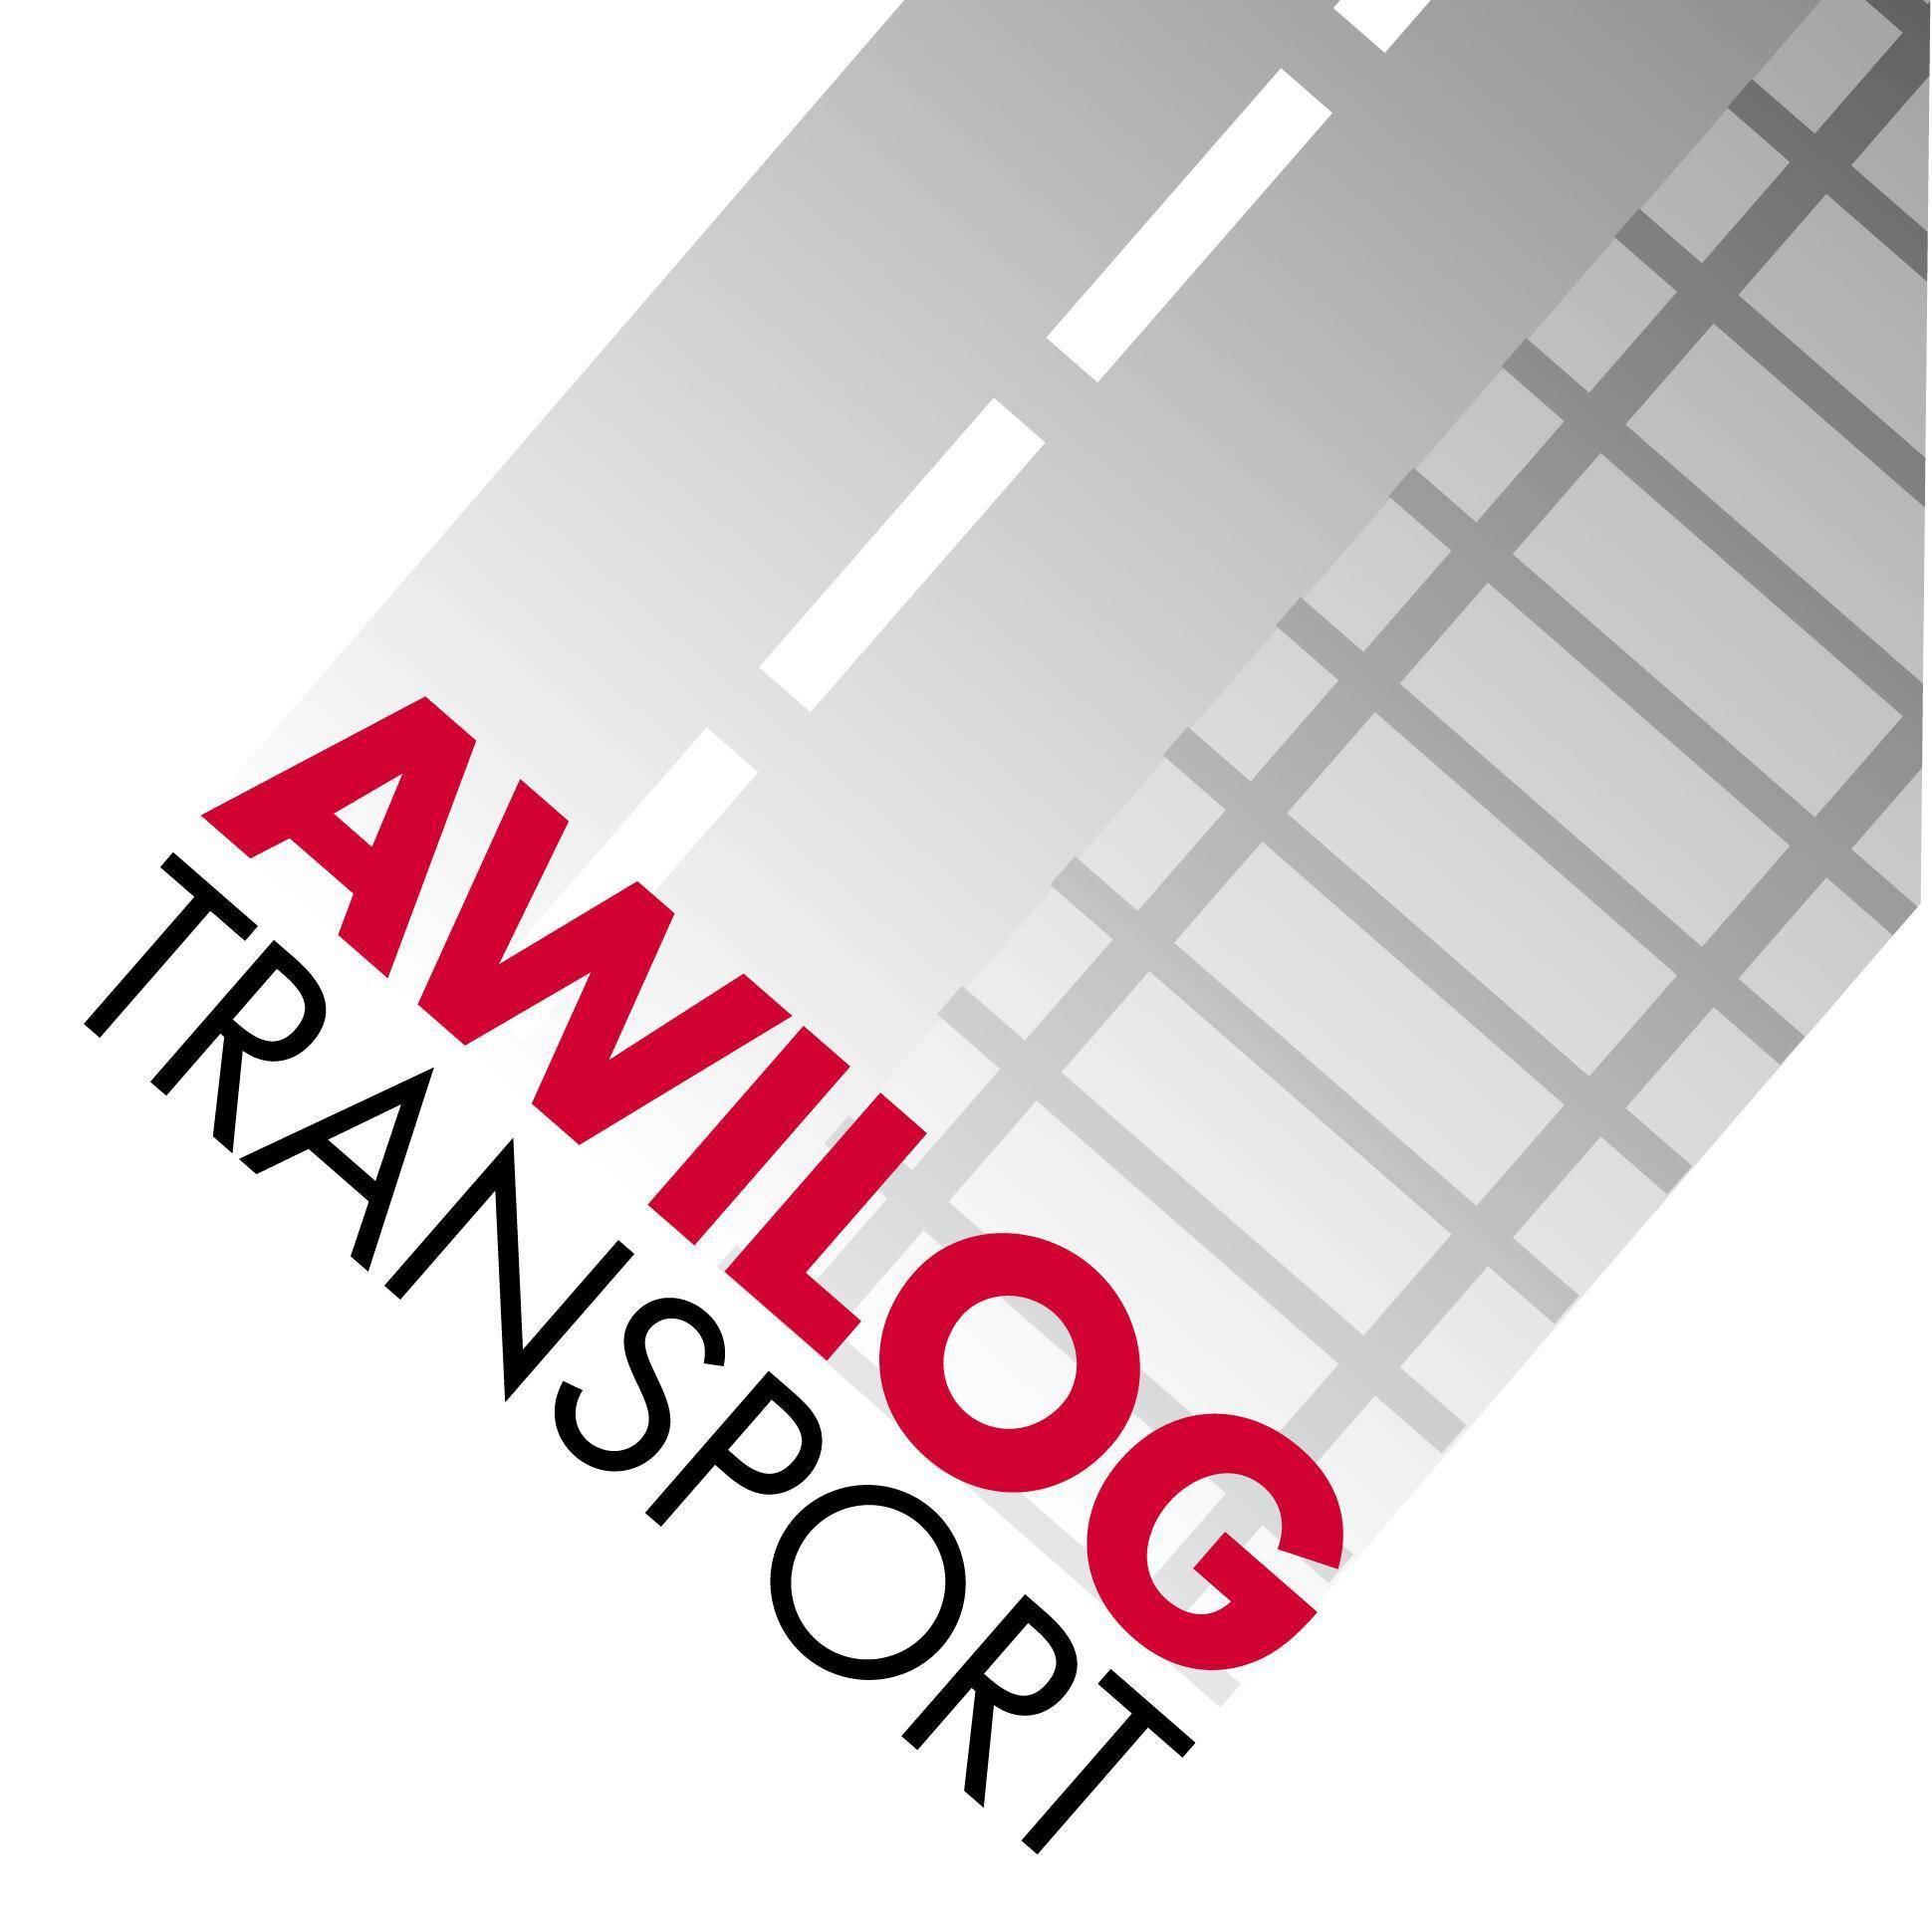 Company logo of AWILOG-Transport GmbH